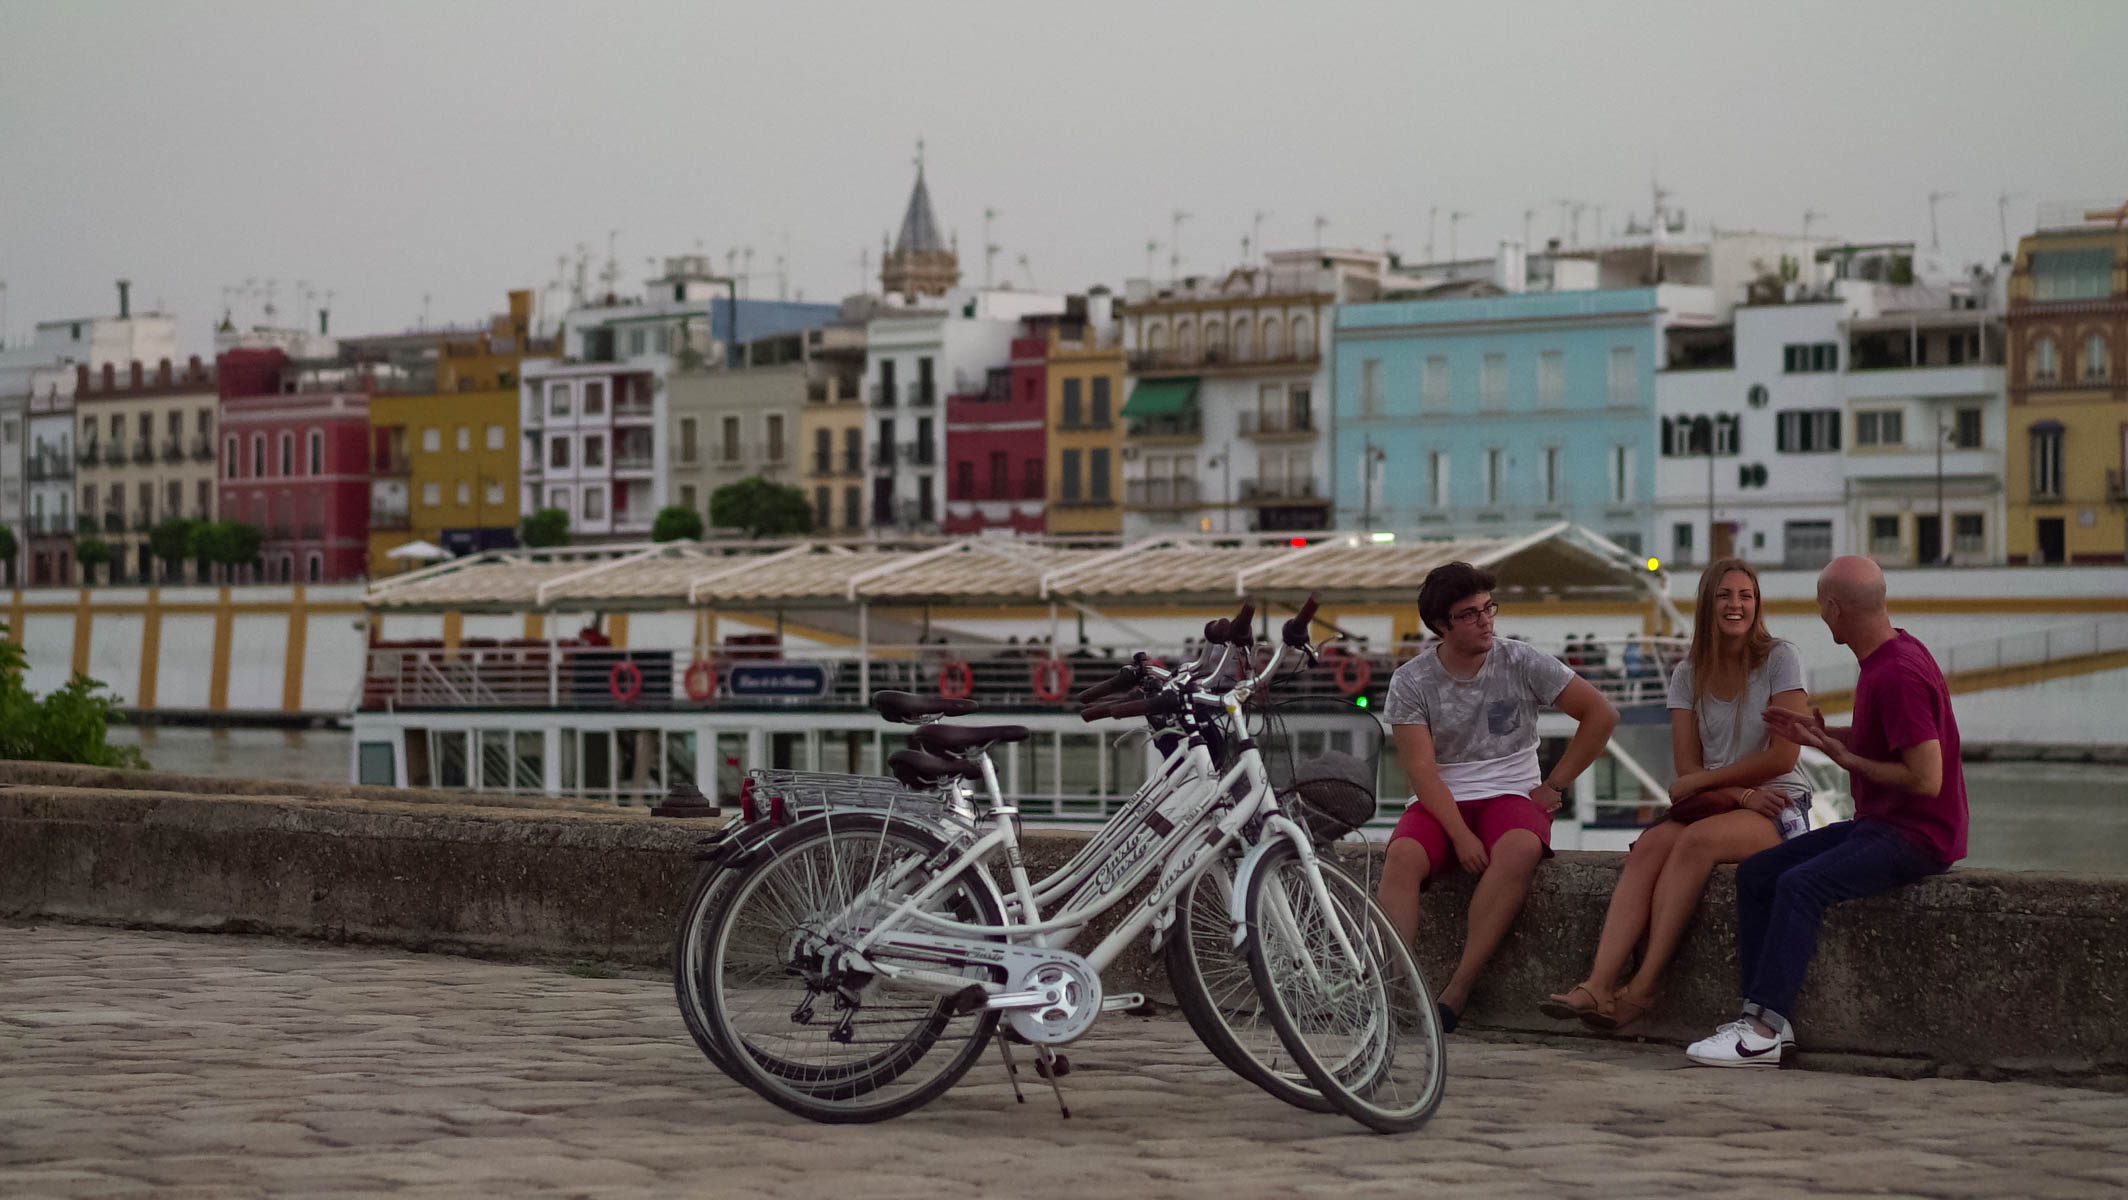 Sevilla's big river: Guadalquivir